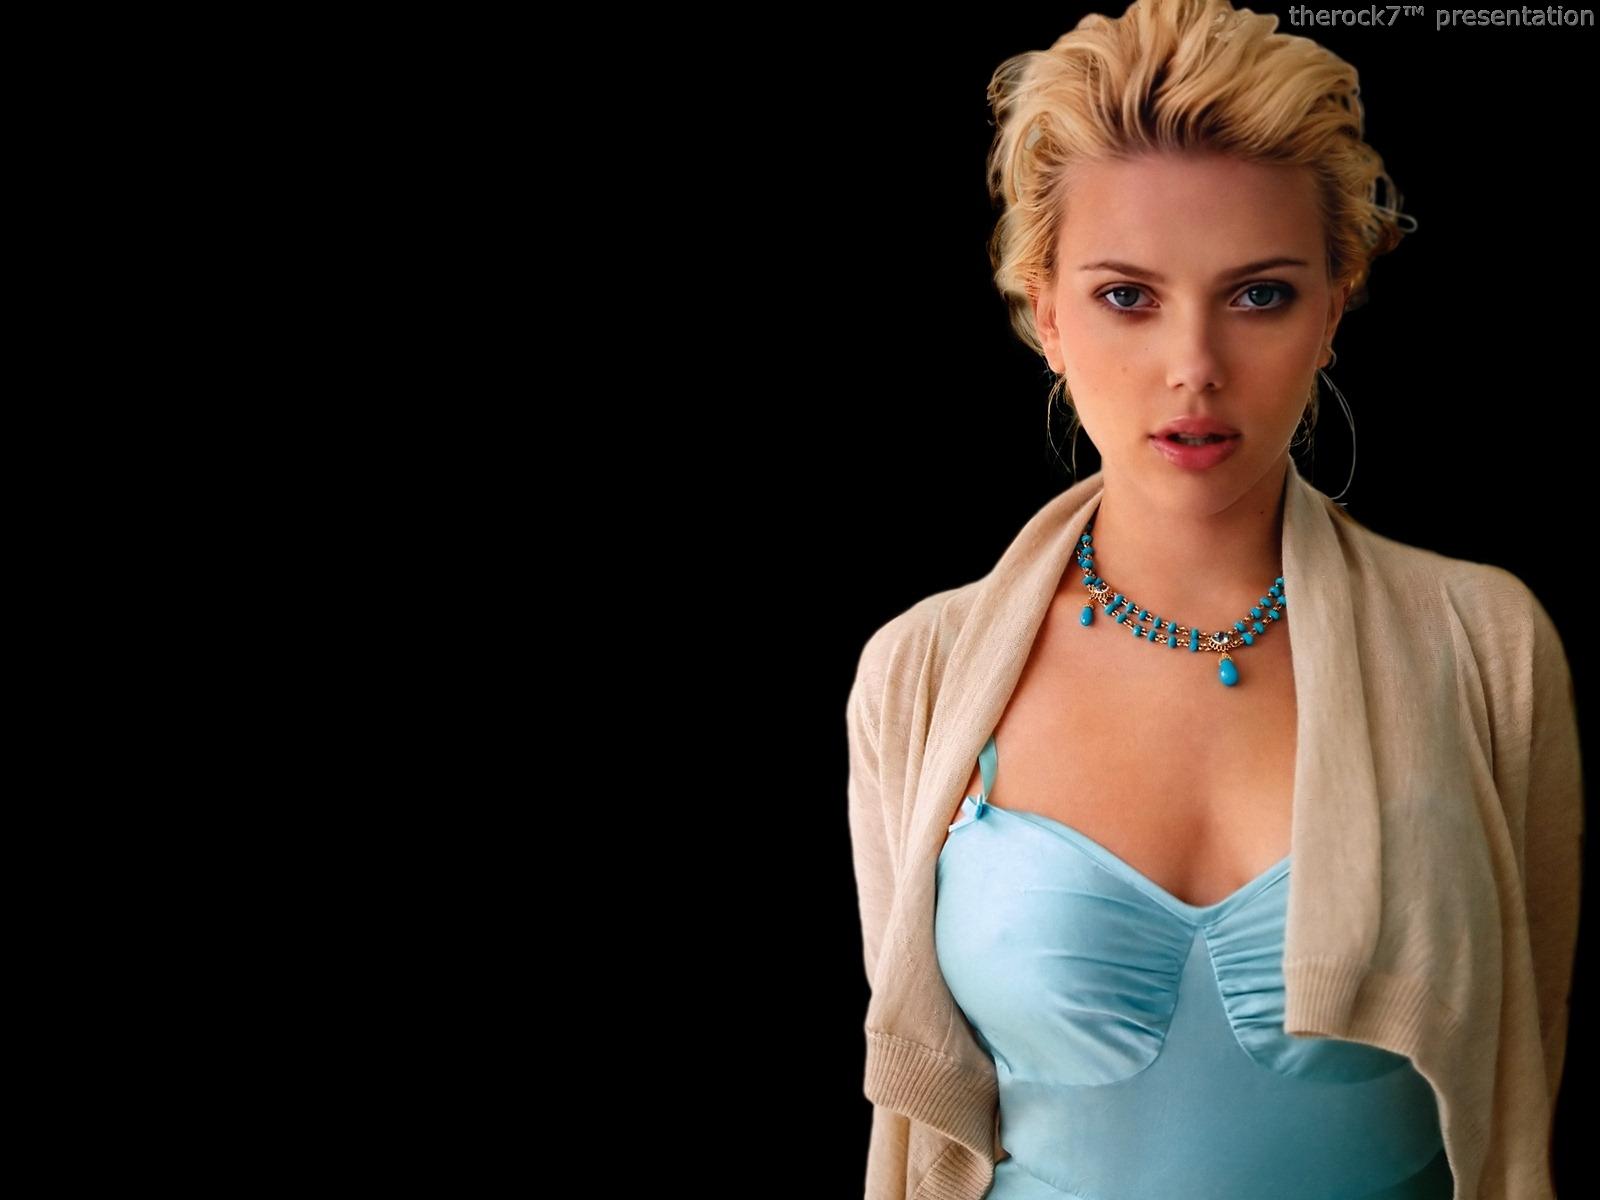 http://4.bp.blogspot.com/-Jg9poPrILdo/UIEX82MapFI/AAAAAAAAJIQ/4JPwkIQcVkg/s1600/Scarlett+Johansson+(3).jpg